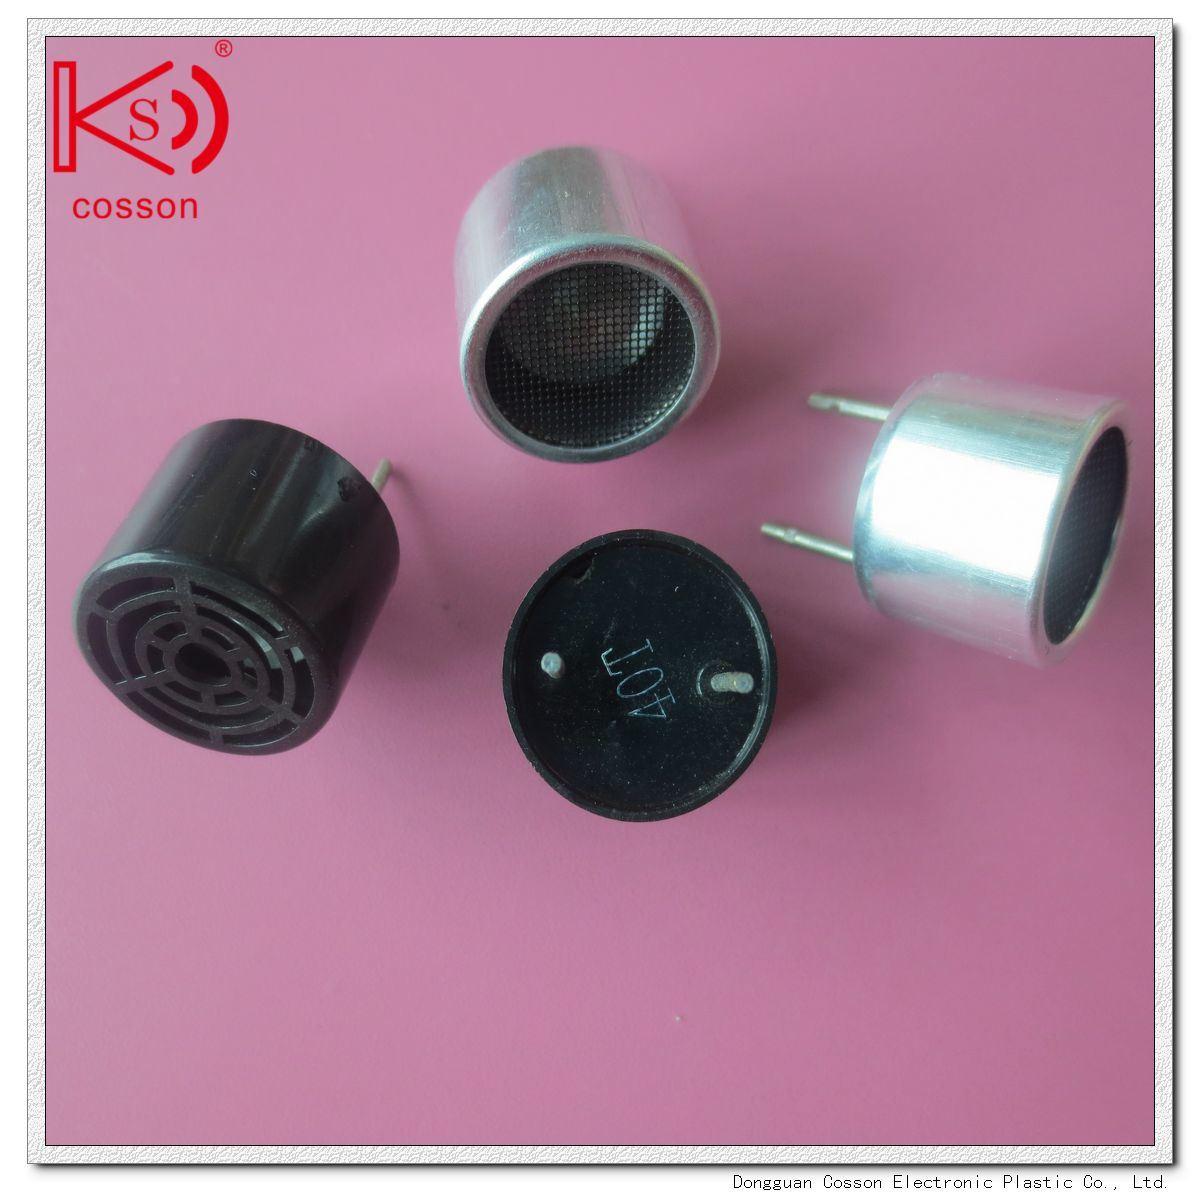 Ultrasonic Transducer 40kHz 16mm Transmitter Receiver Sensor